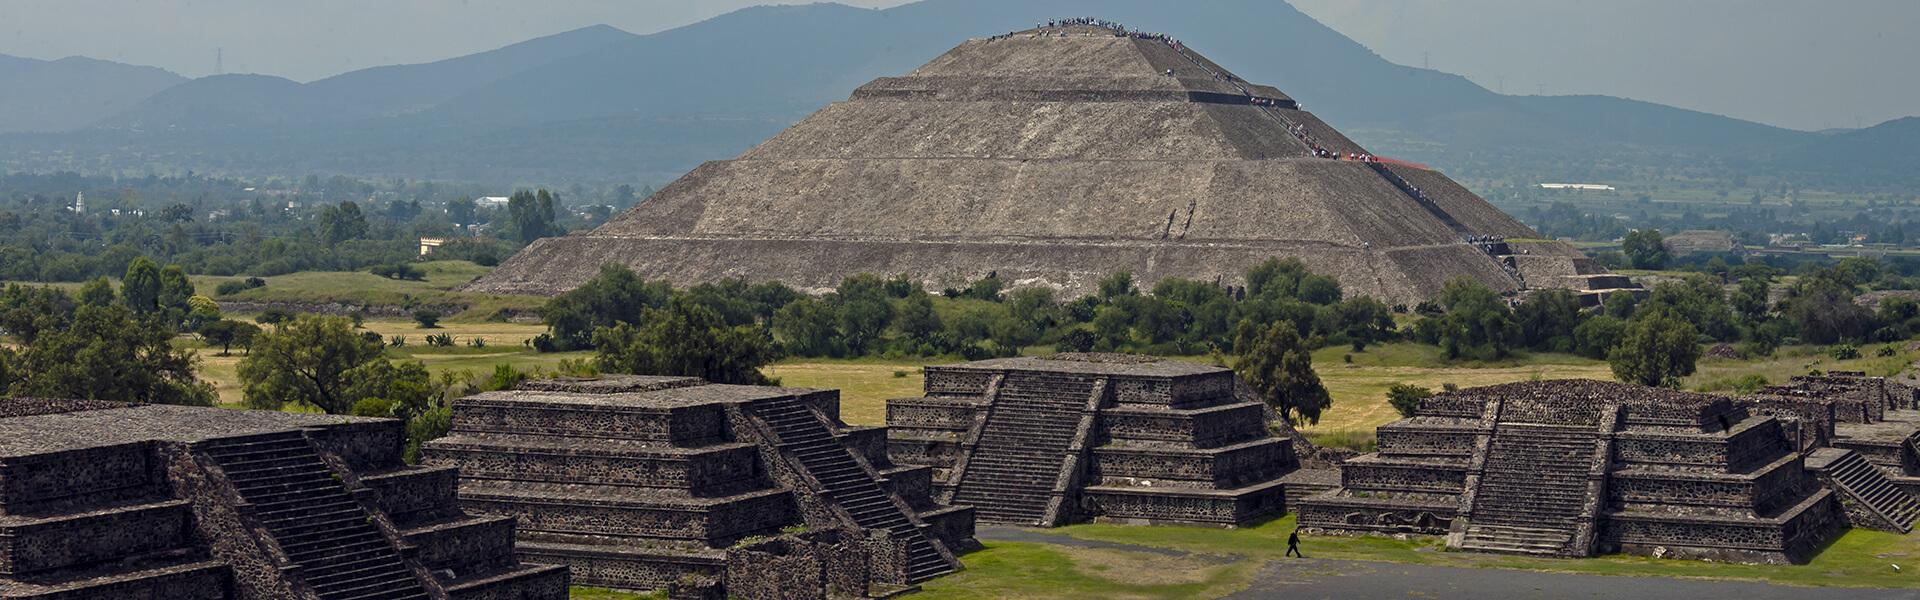 Settimana Santa fra Messico, Guatemala con una puntatina in Honduras